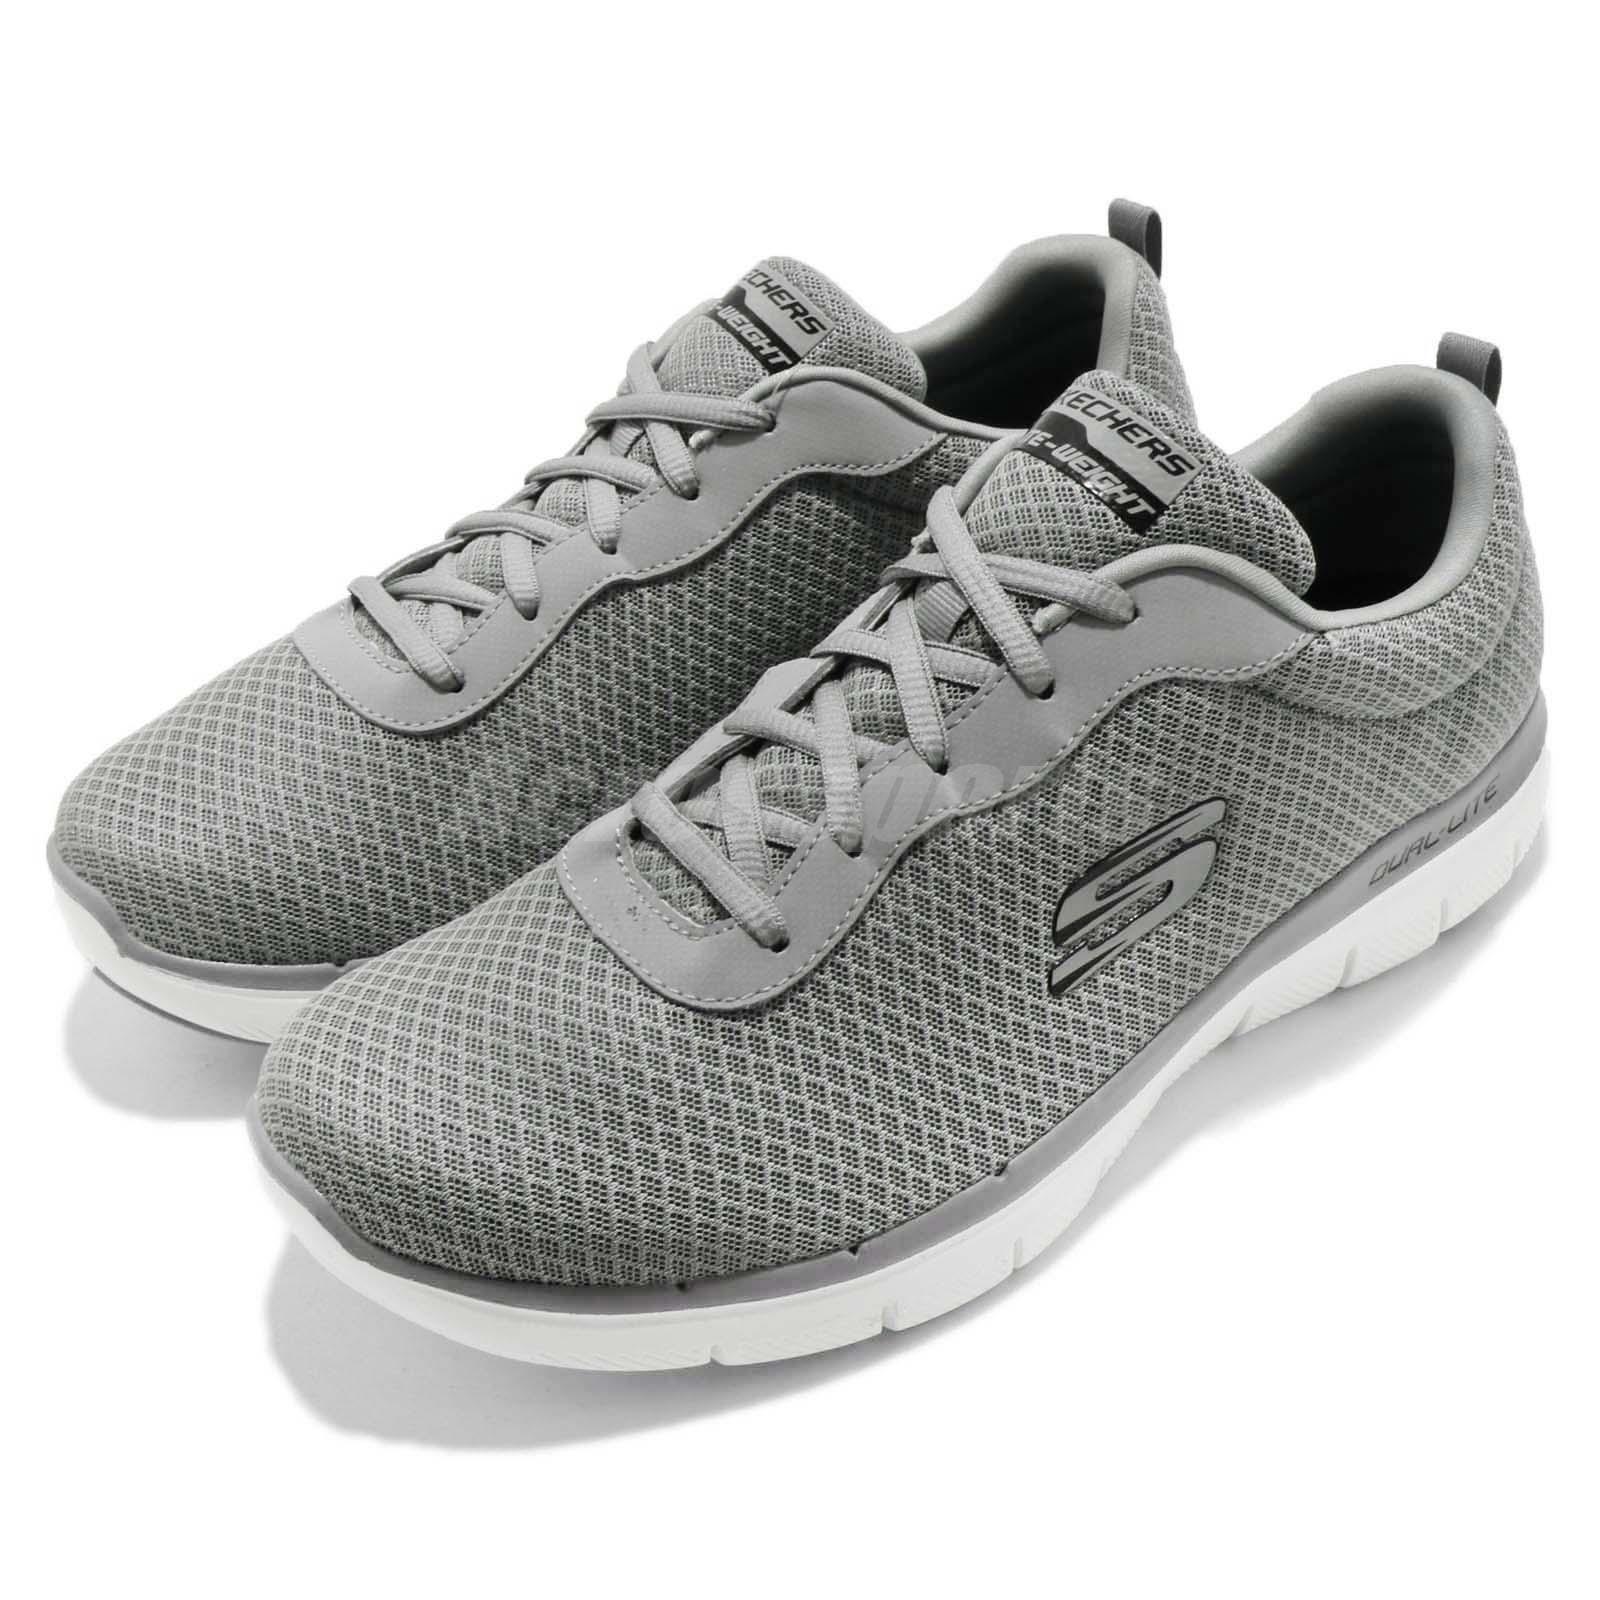 Skechers Flex Advantage 2.0 Dayshow gris blanco Men Walking zapatos 52125-GRY